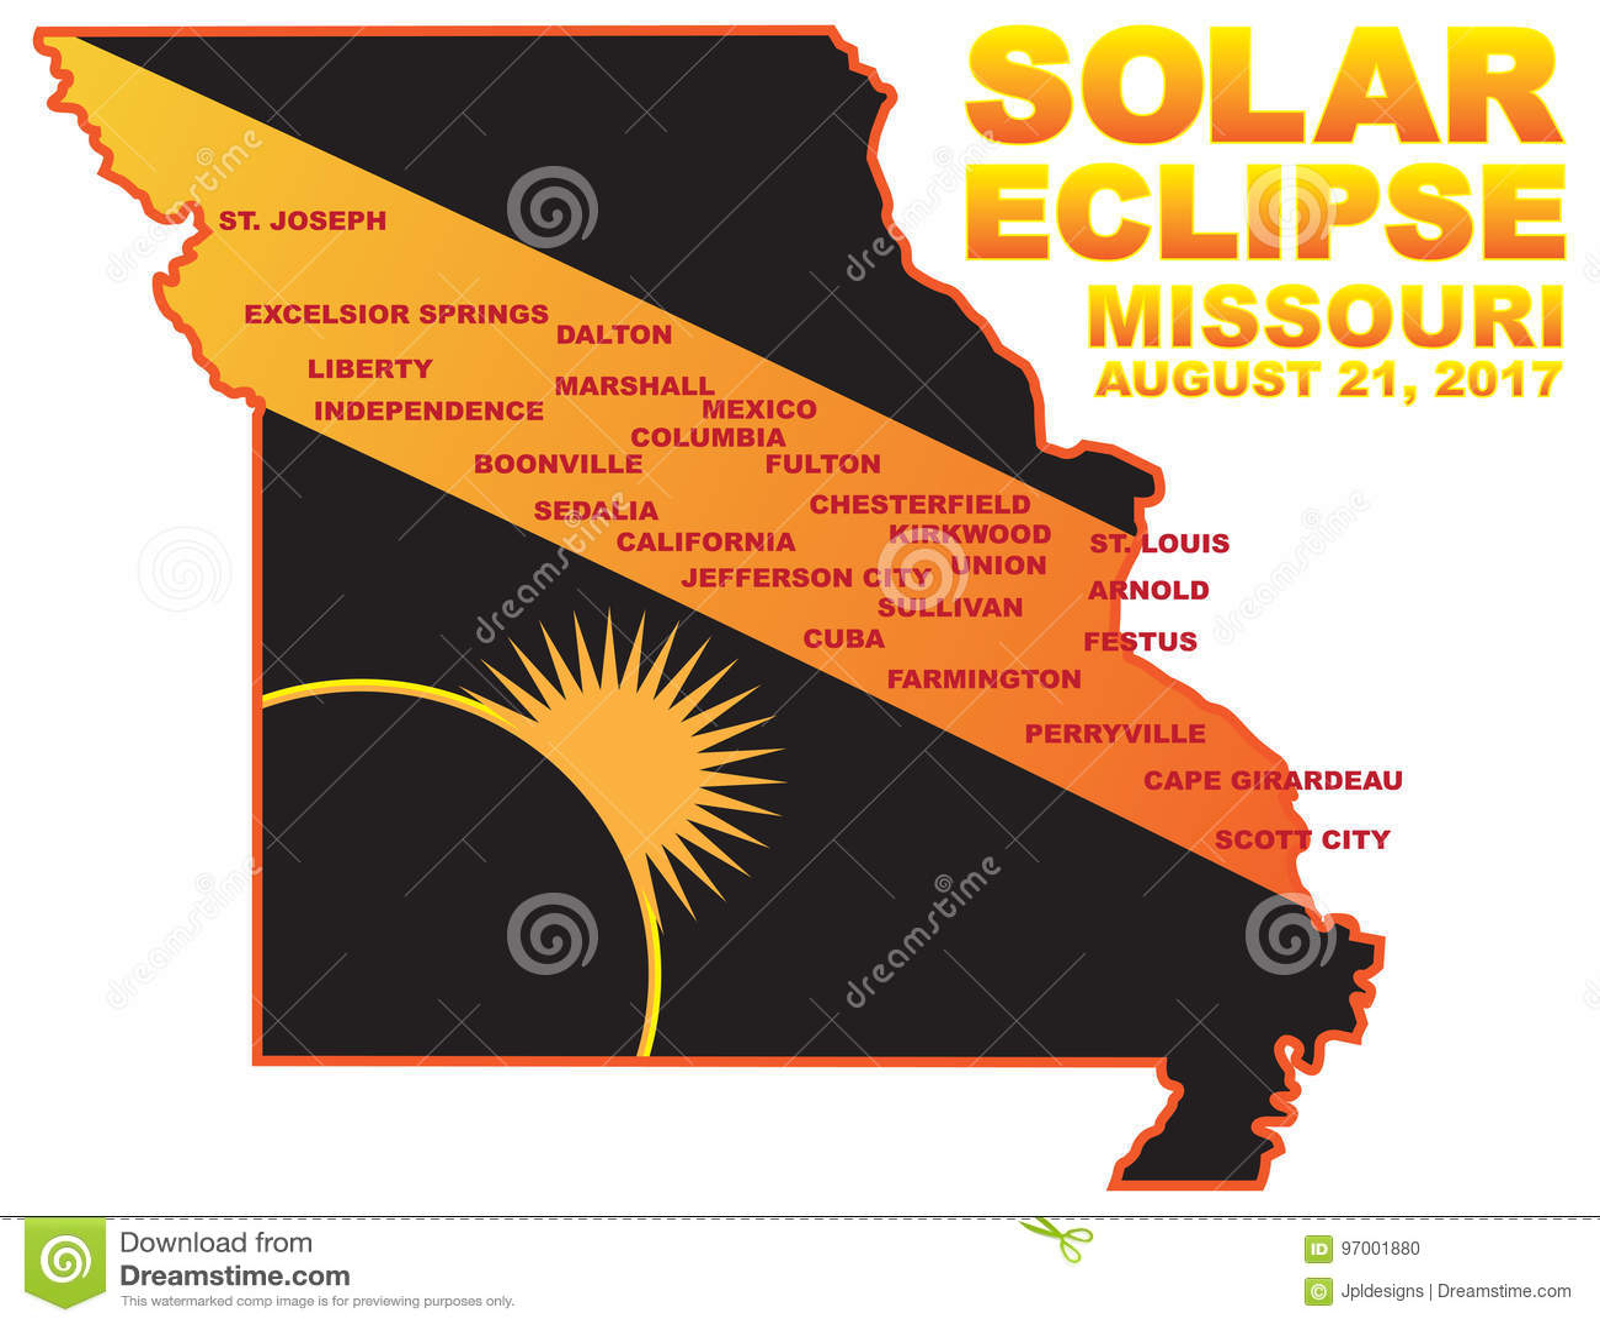 2017 Solar Eclipse Across Missouri Cities Map Vector Illustration